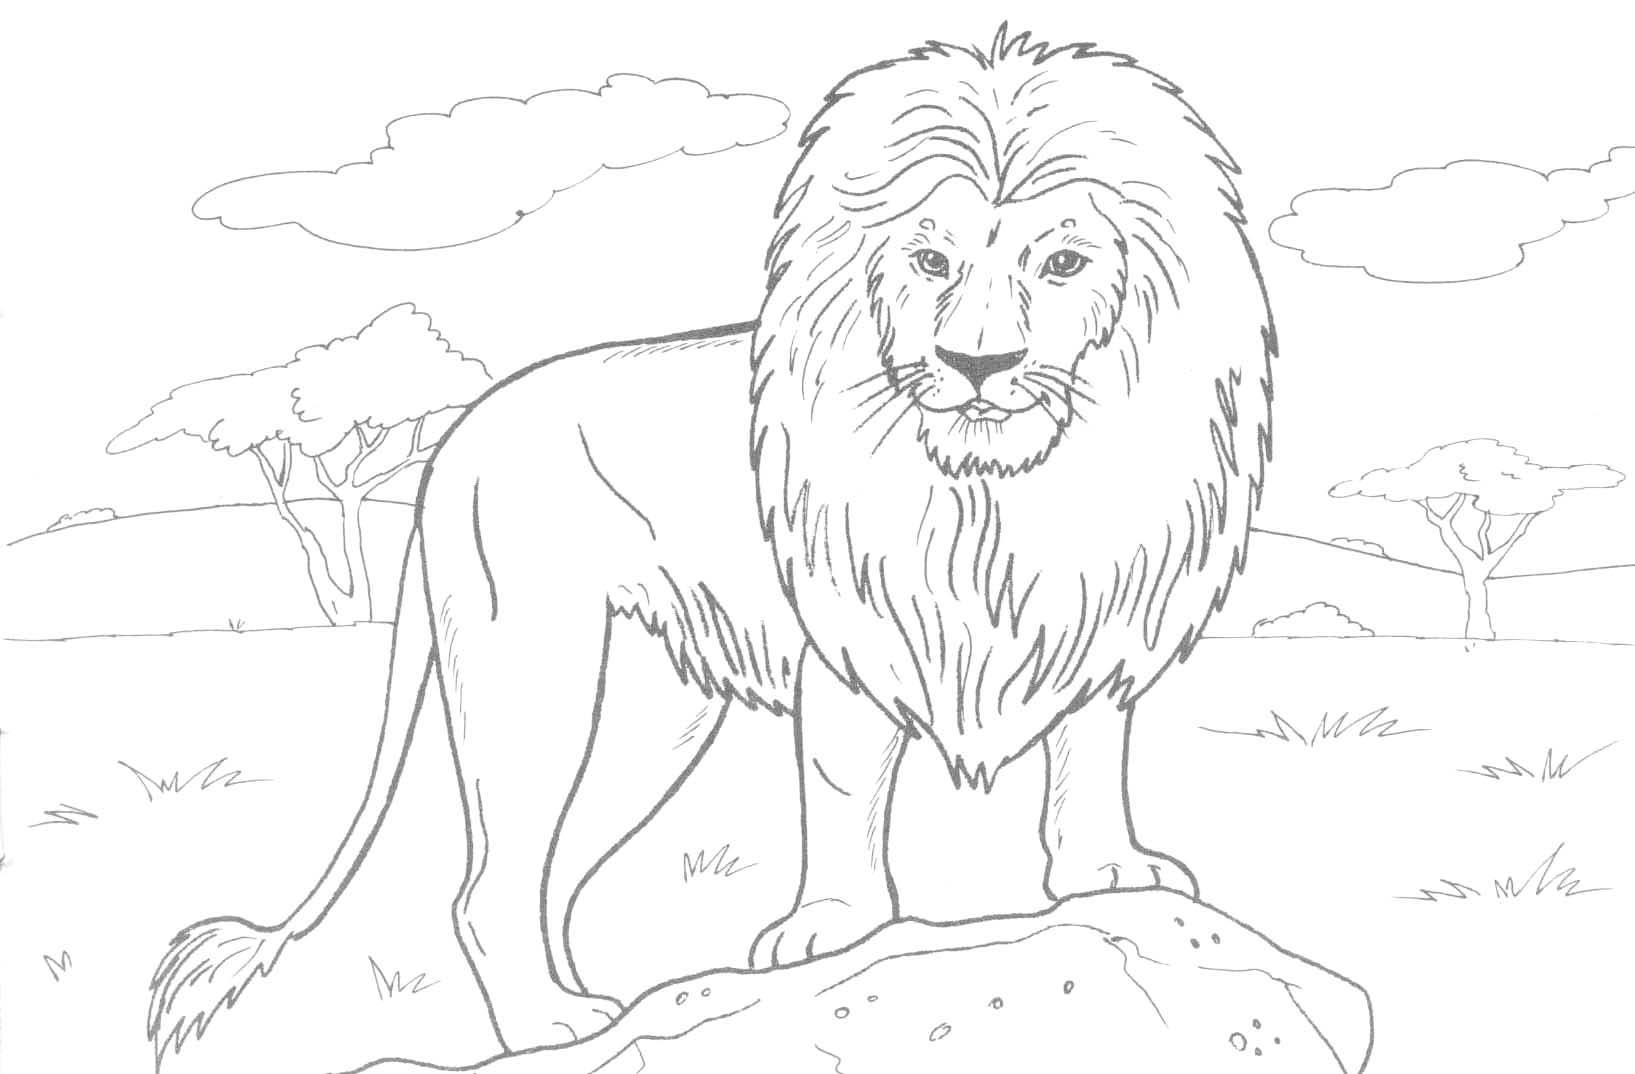 Realistic Animal Coloring Pages - Lezincnyc - Free Printable Realistic Animal Coloring Pages